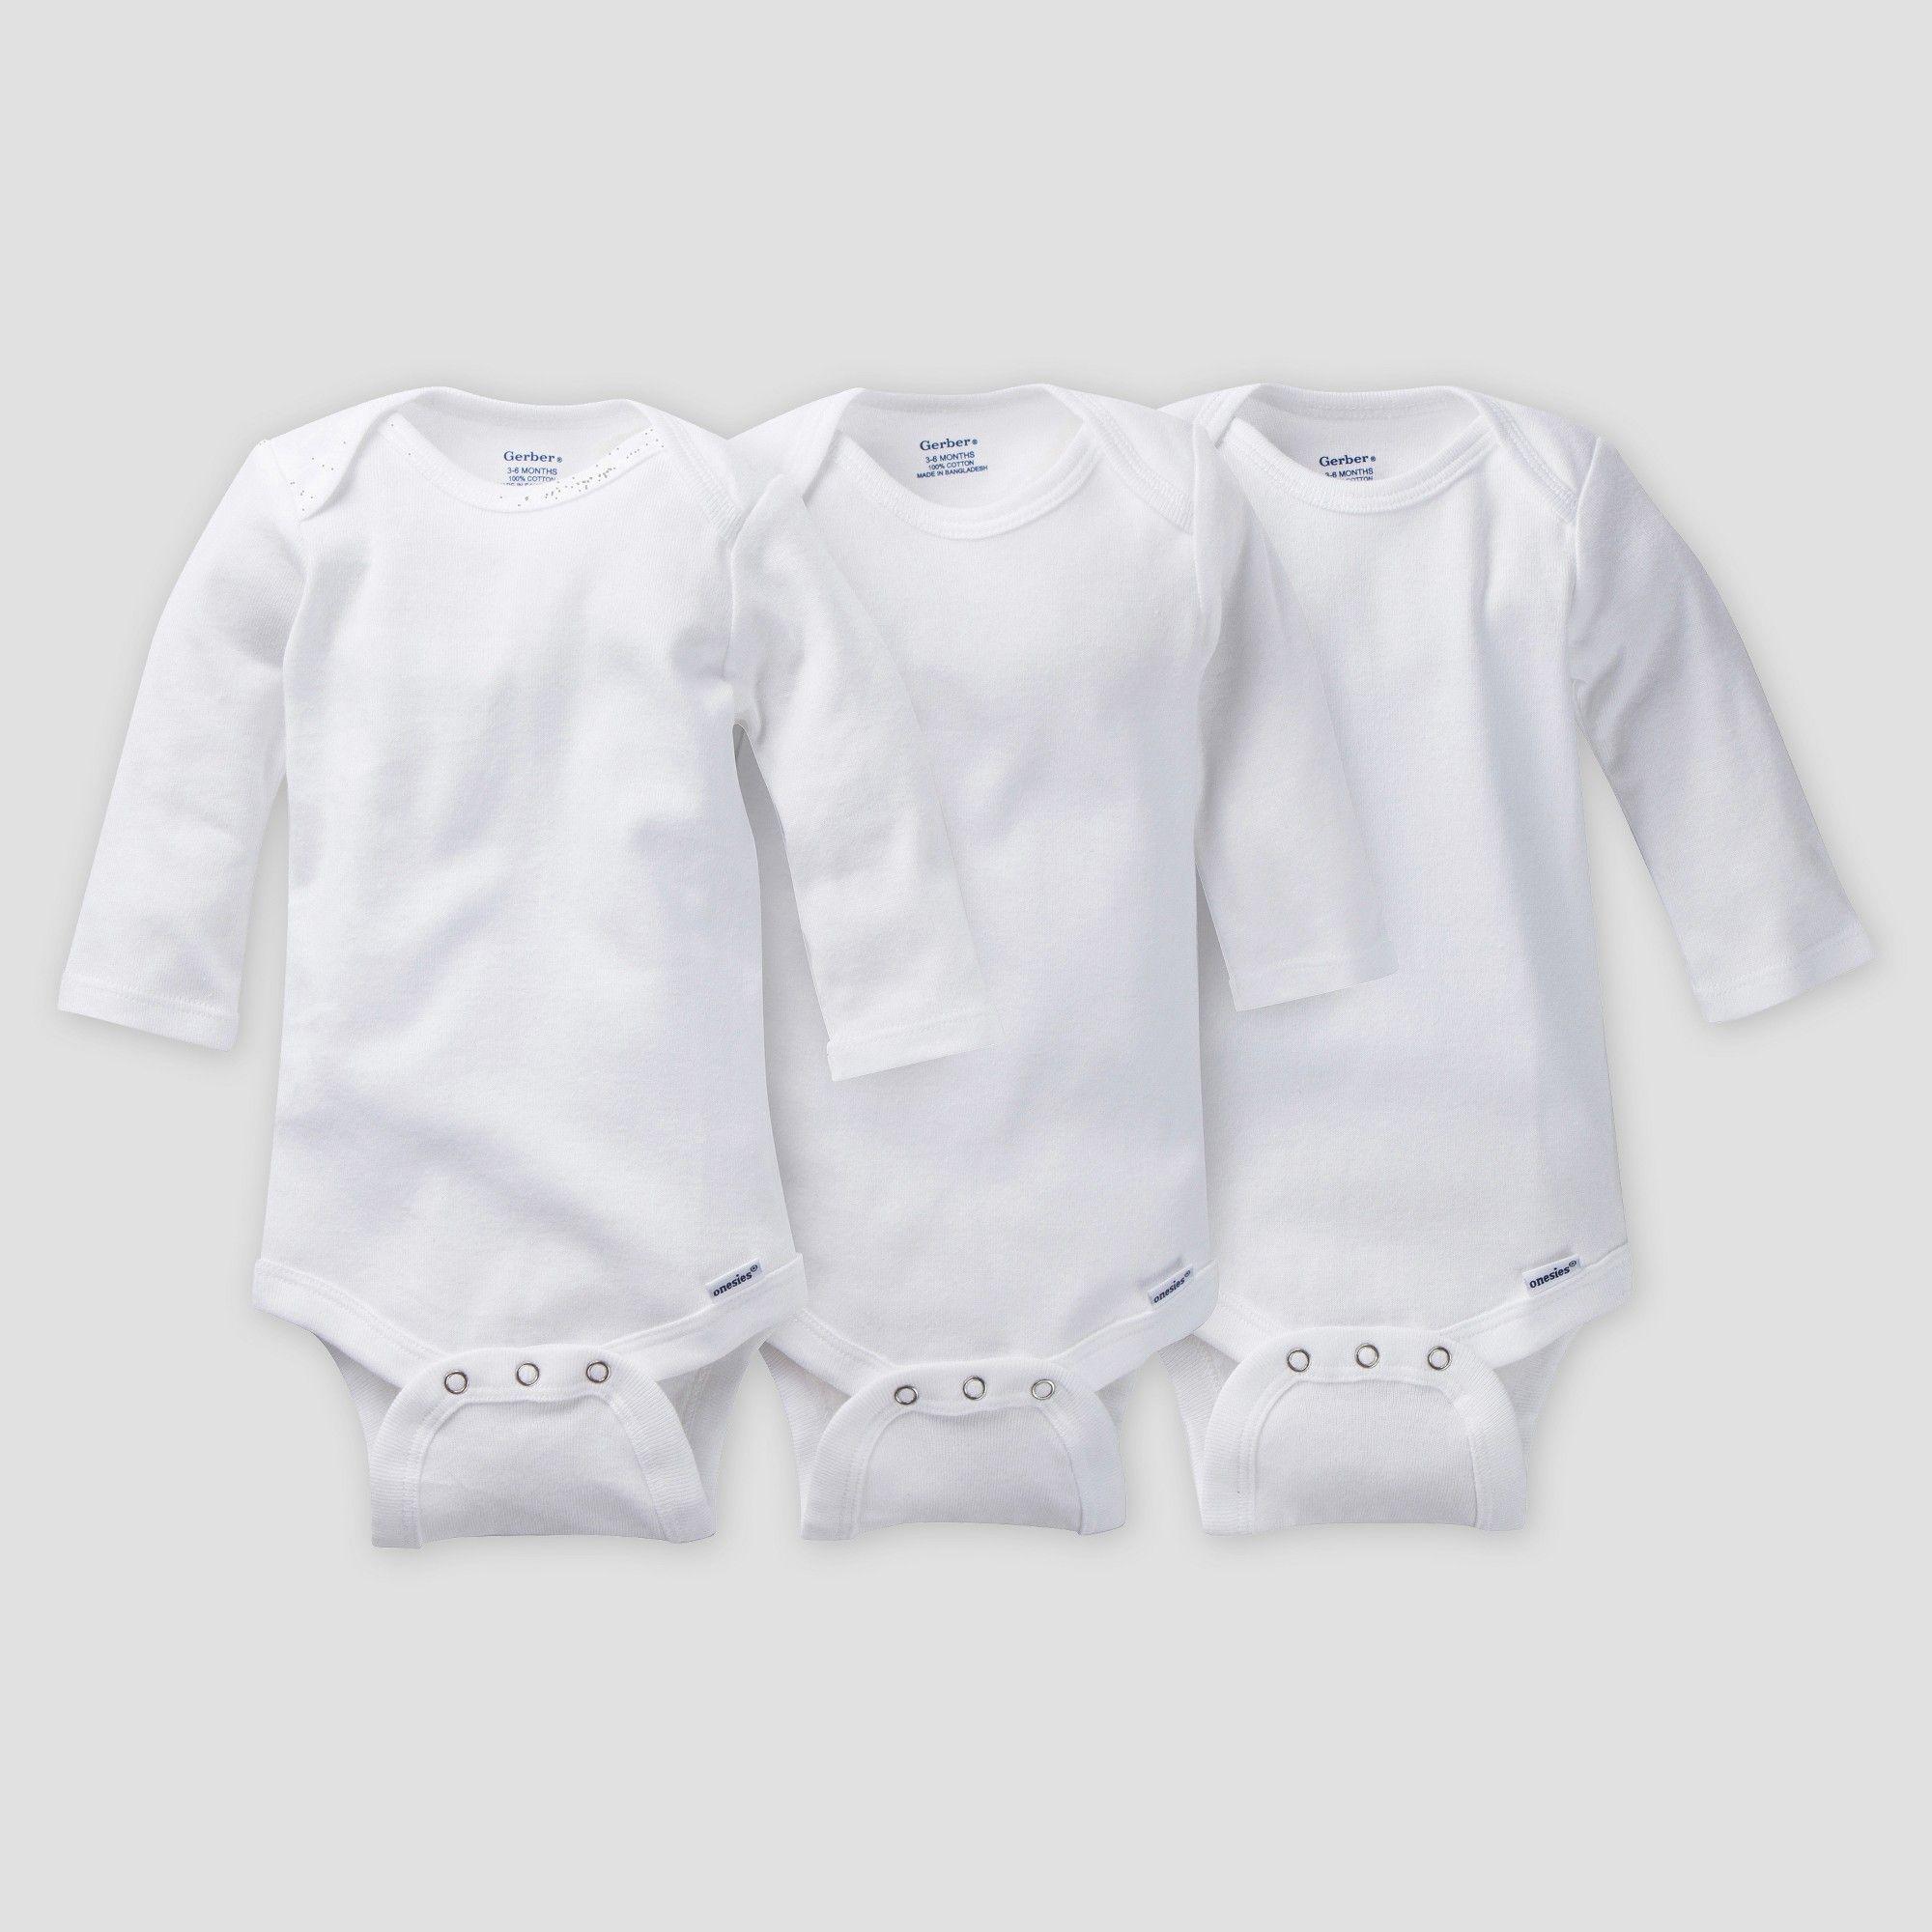 White GERBER Baby Boy or Girl Unisex Organic Cotton 3-Pack Long Sleeve Onesies